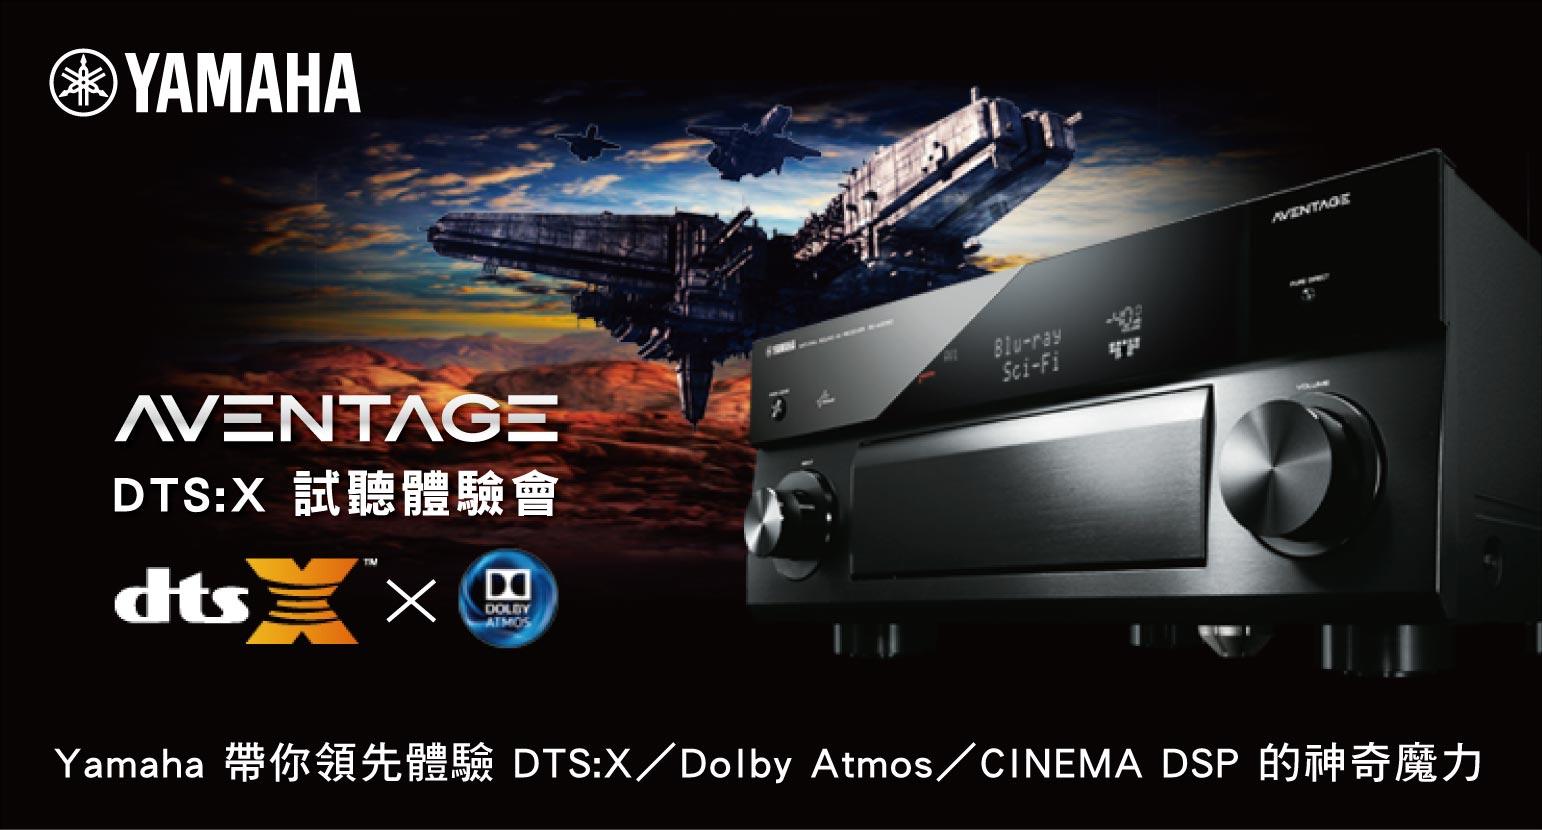 Yamaha 帶你領先體驗 DTS:X/Dolby Atmos/CINEMA DSP 的神奇魔力